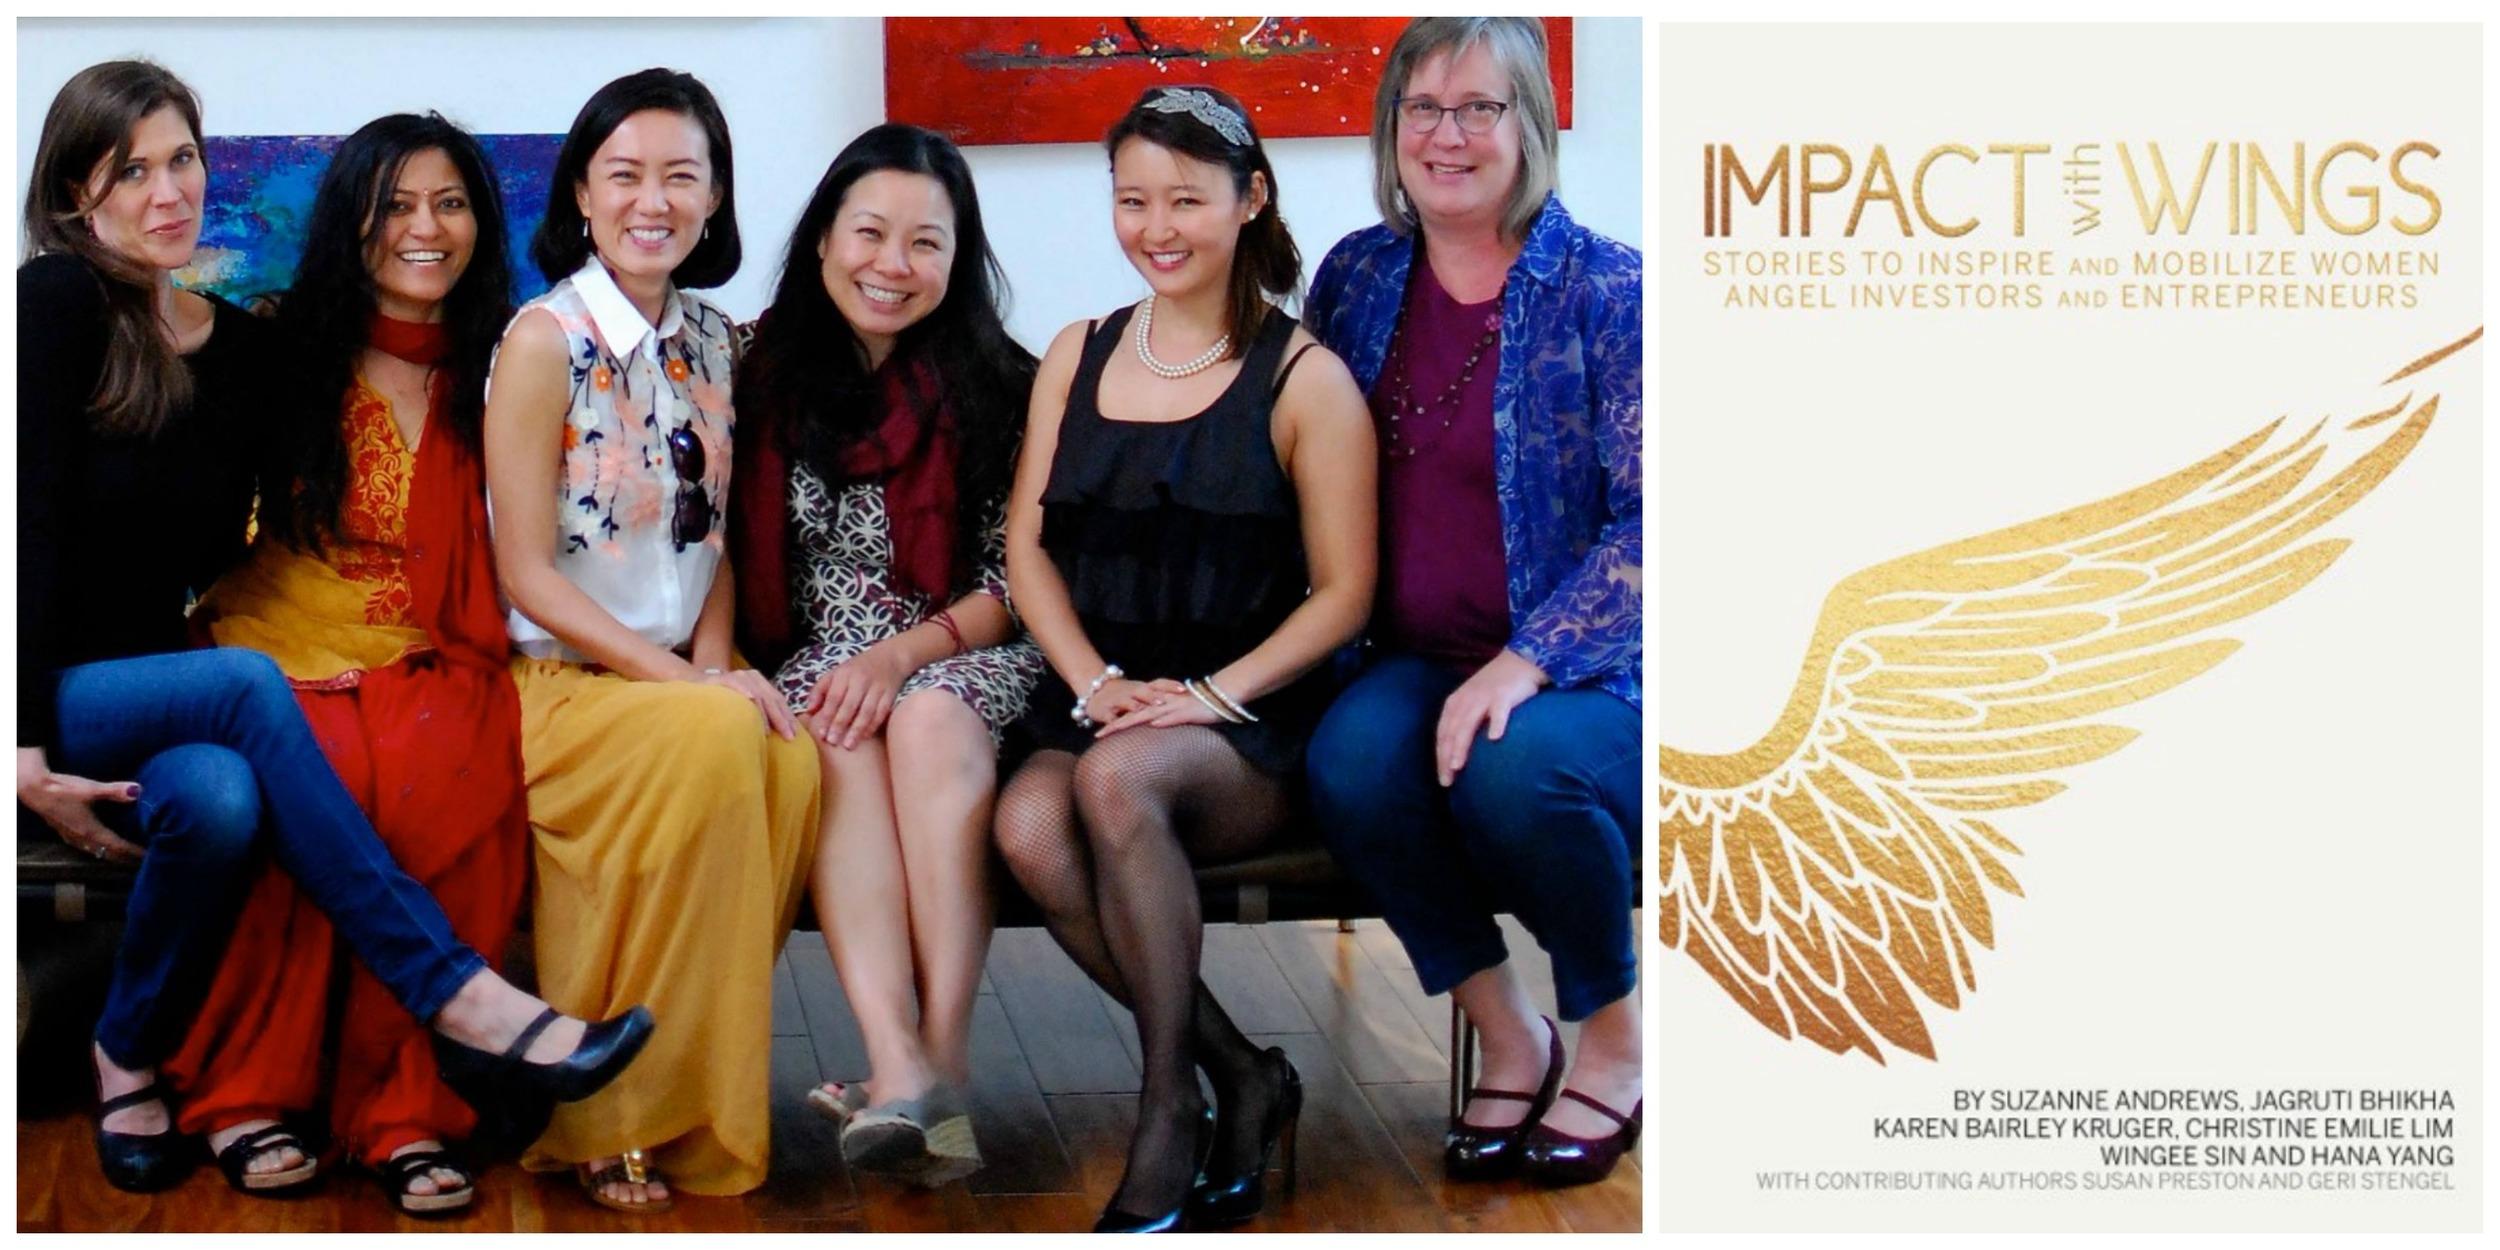 Karen Bairley Kruger,Jagruti Bhikha,CE Lim, Wingee Sin, Hana Yang and Suzanne Andrews